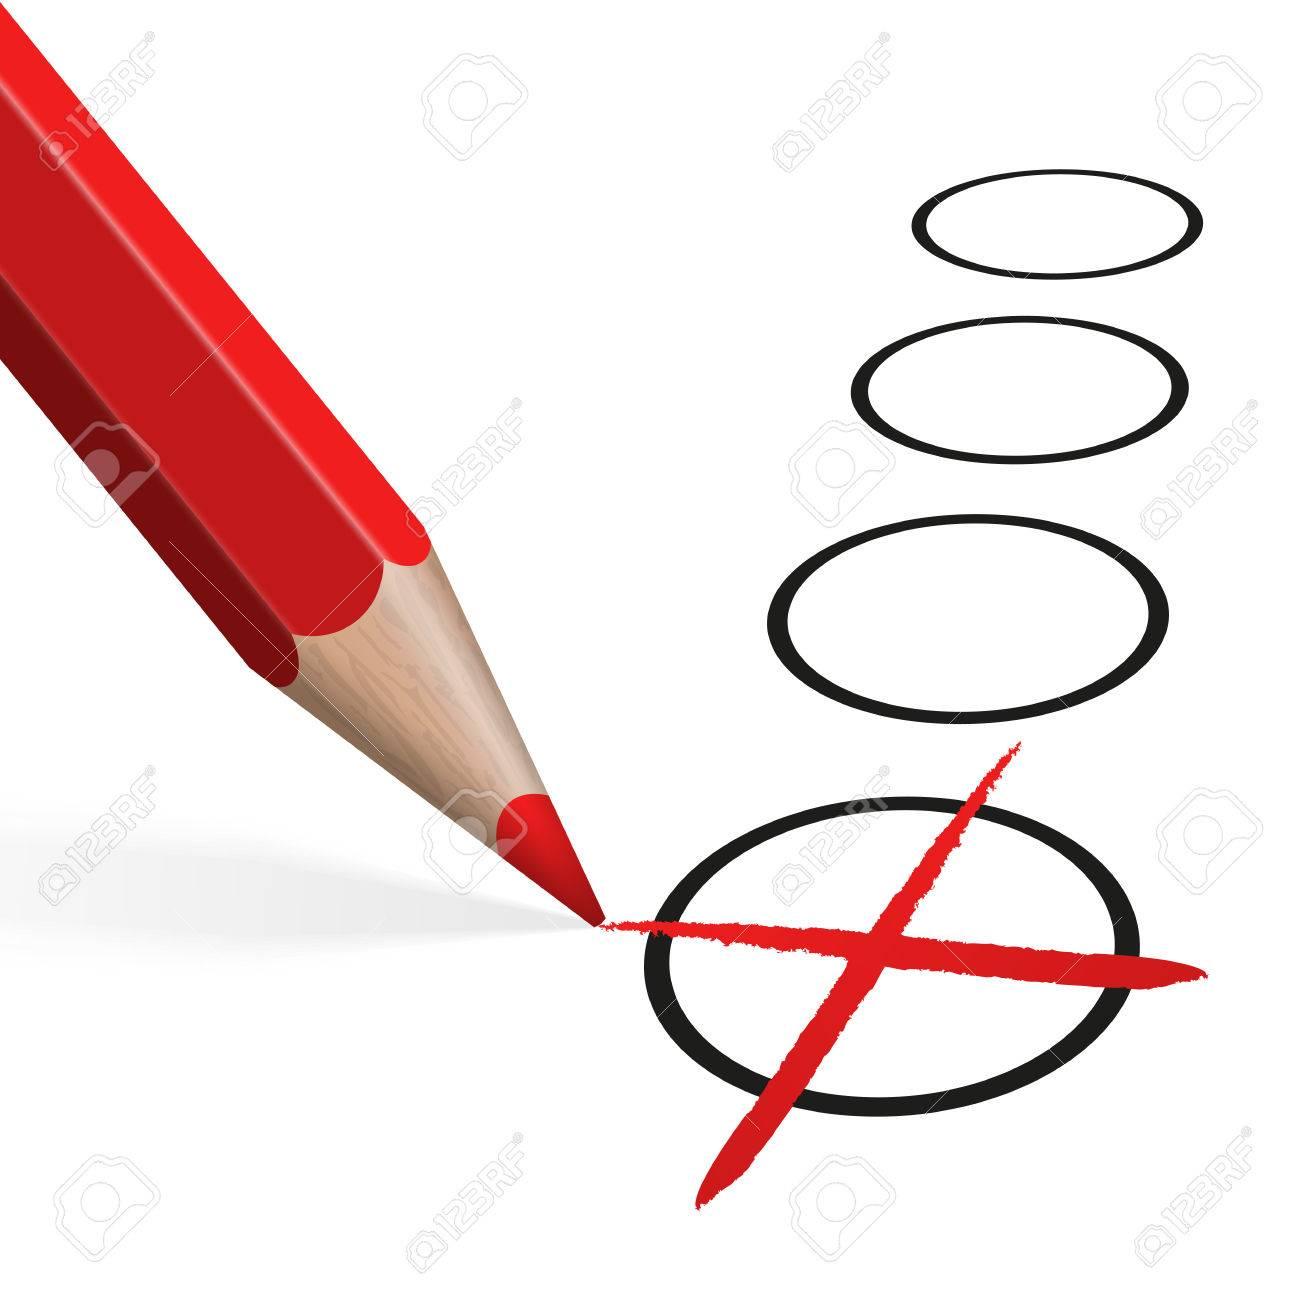 Cruz Roja Dibujo De Lapiz Coloreado Para El Uso De La Seleccion